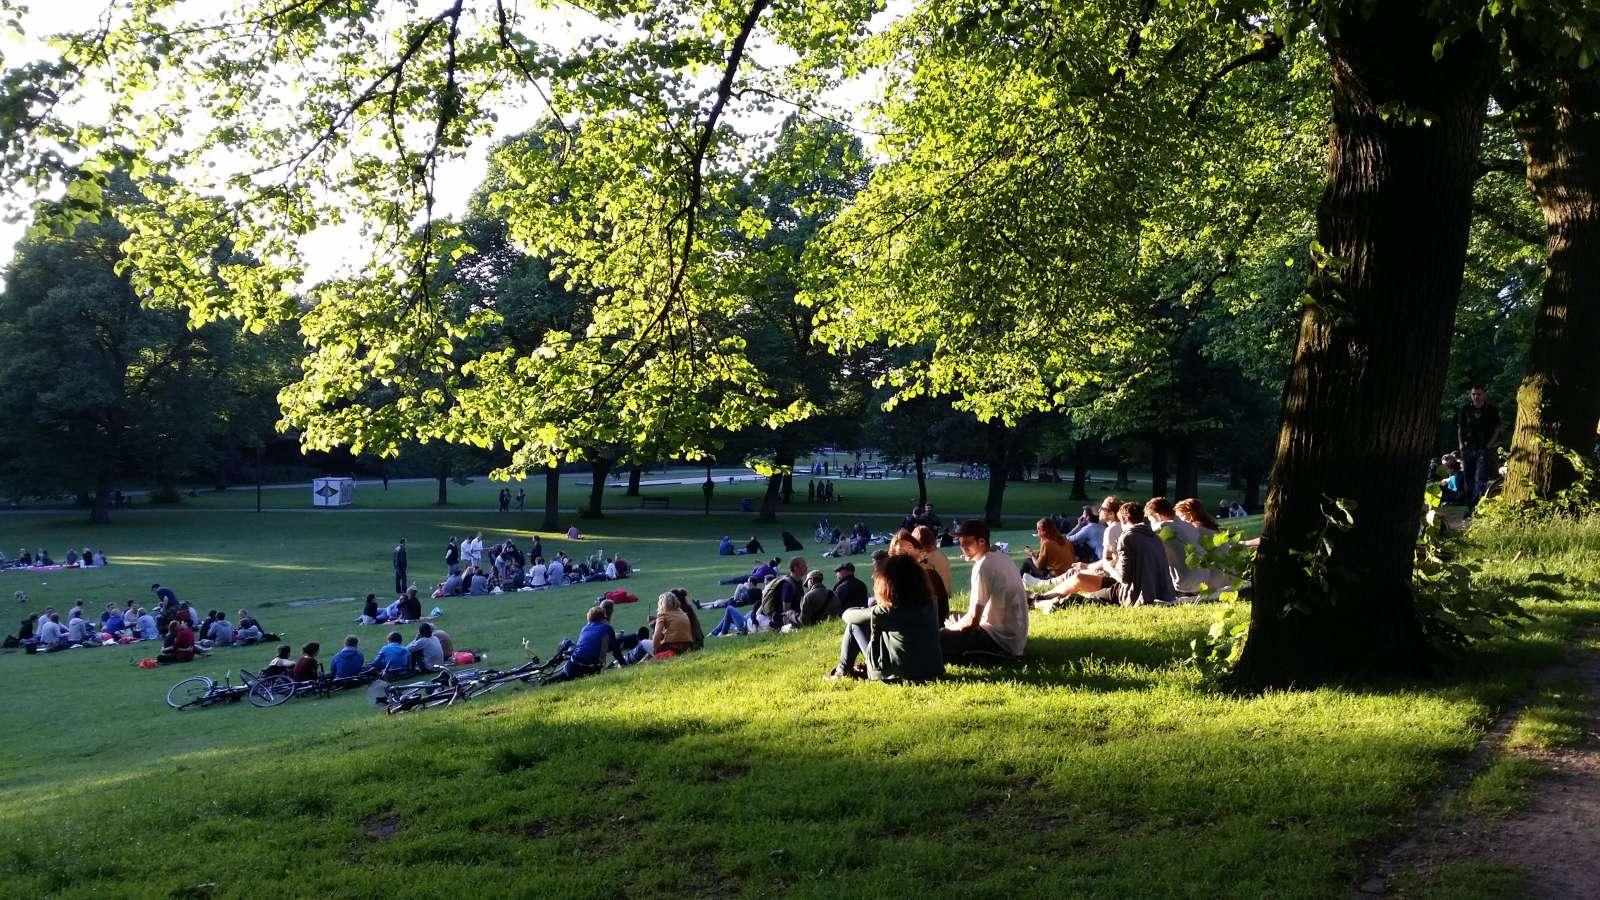 Der Schanzenpark im Sommer / Foto: www.elbpresse.de [CC BY-SA 4.0 (https://creativecommons.org/licenses/by-sa/4.0)]